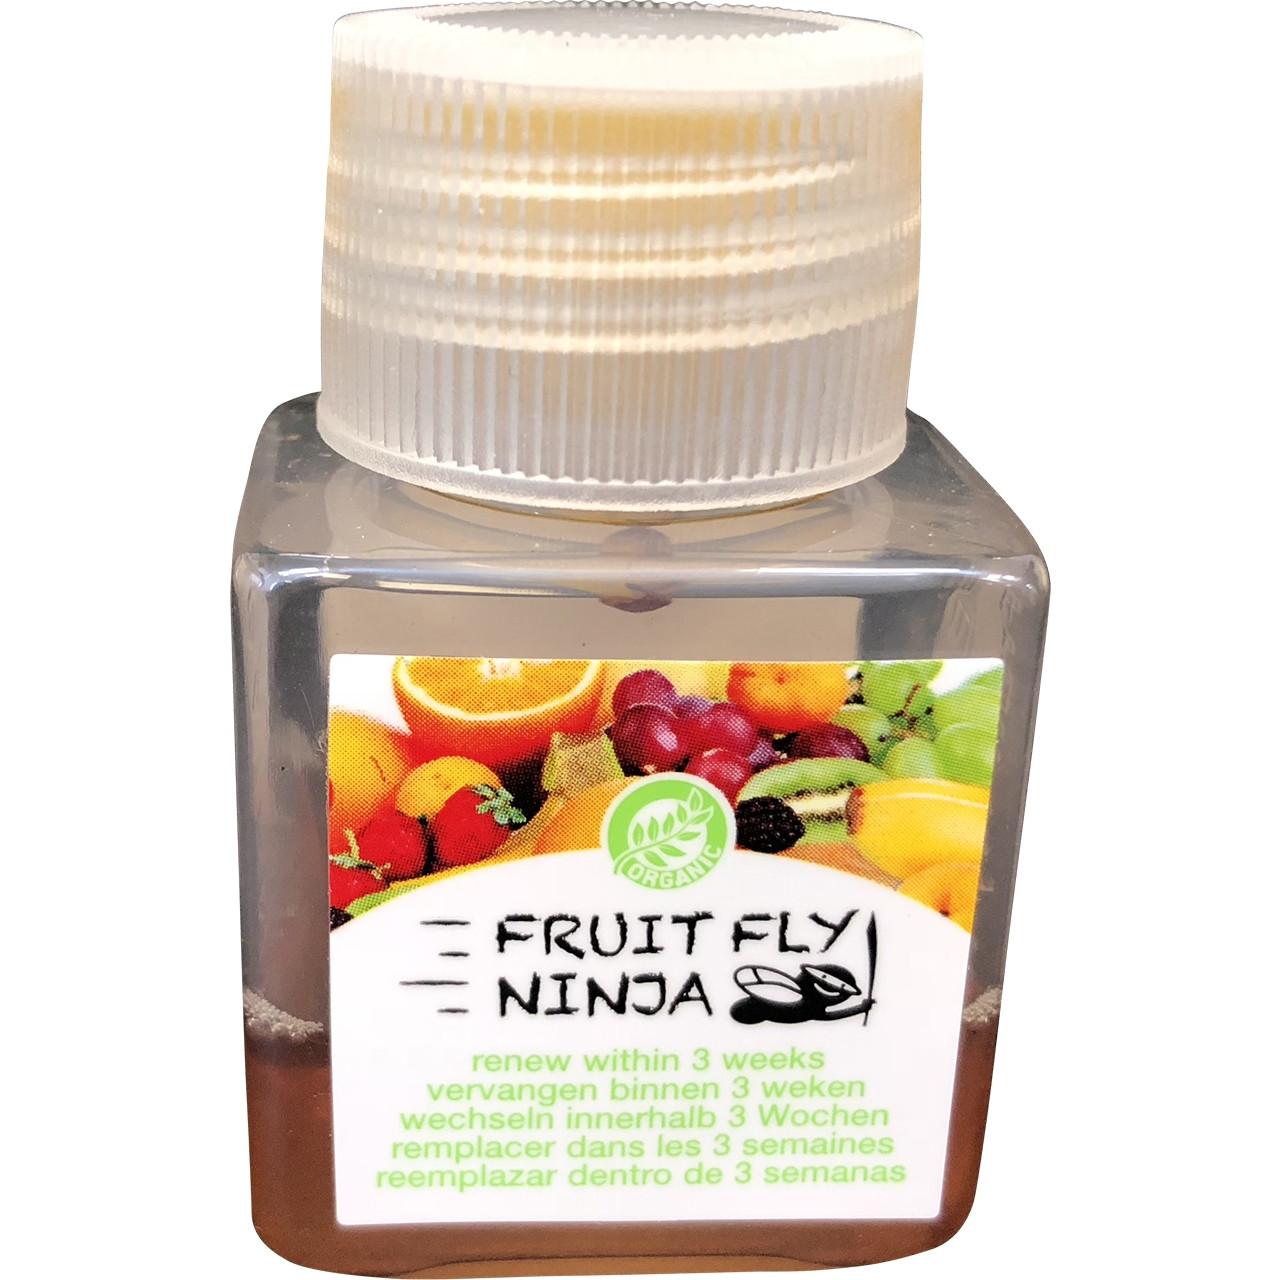 Fruit fly ninja 3x5cm